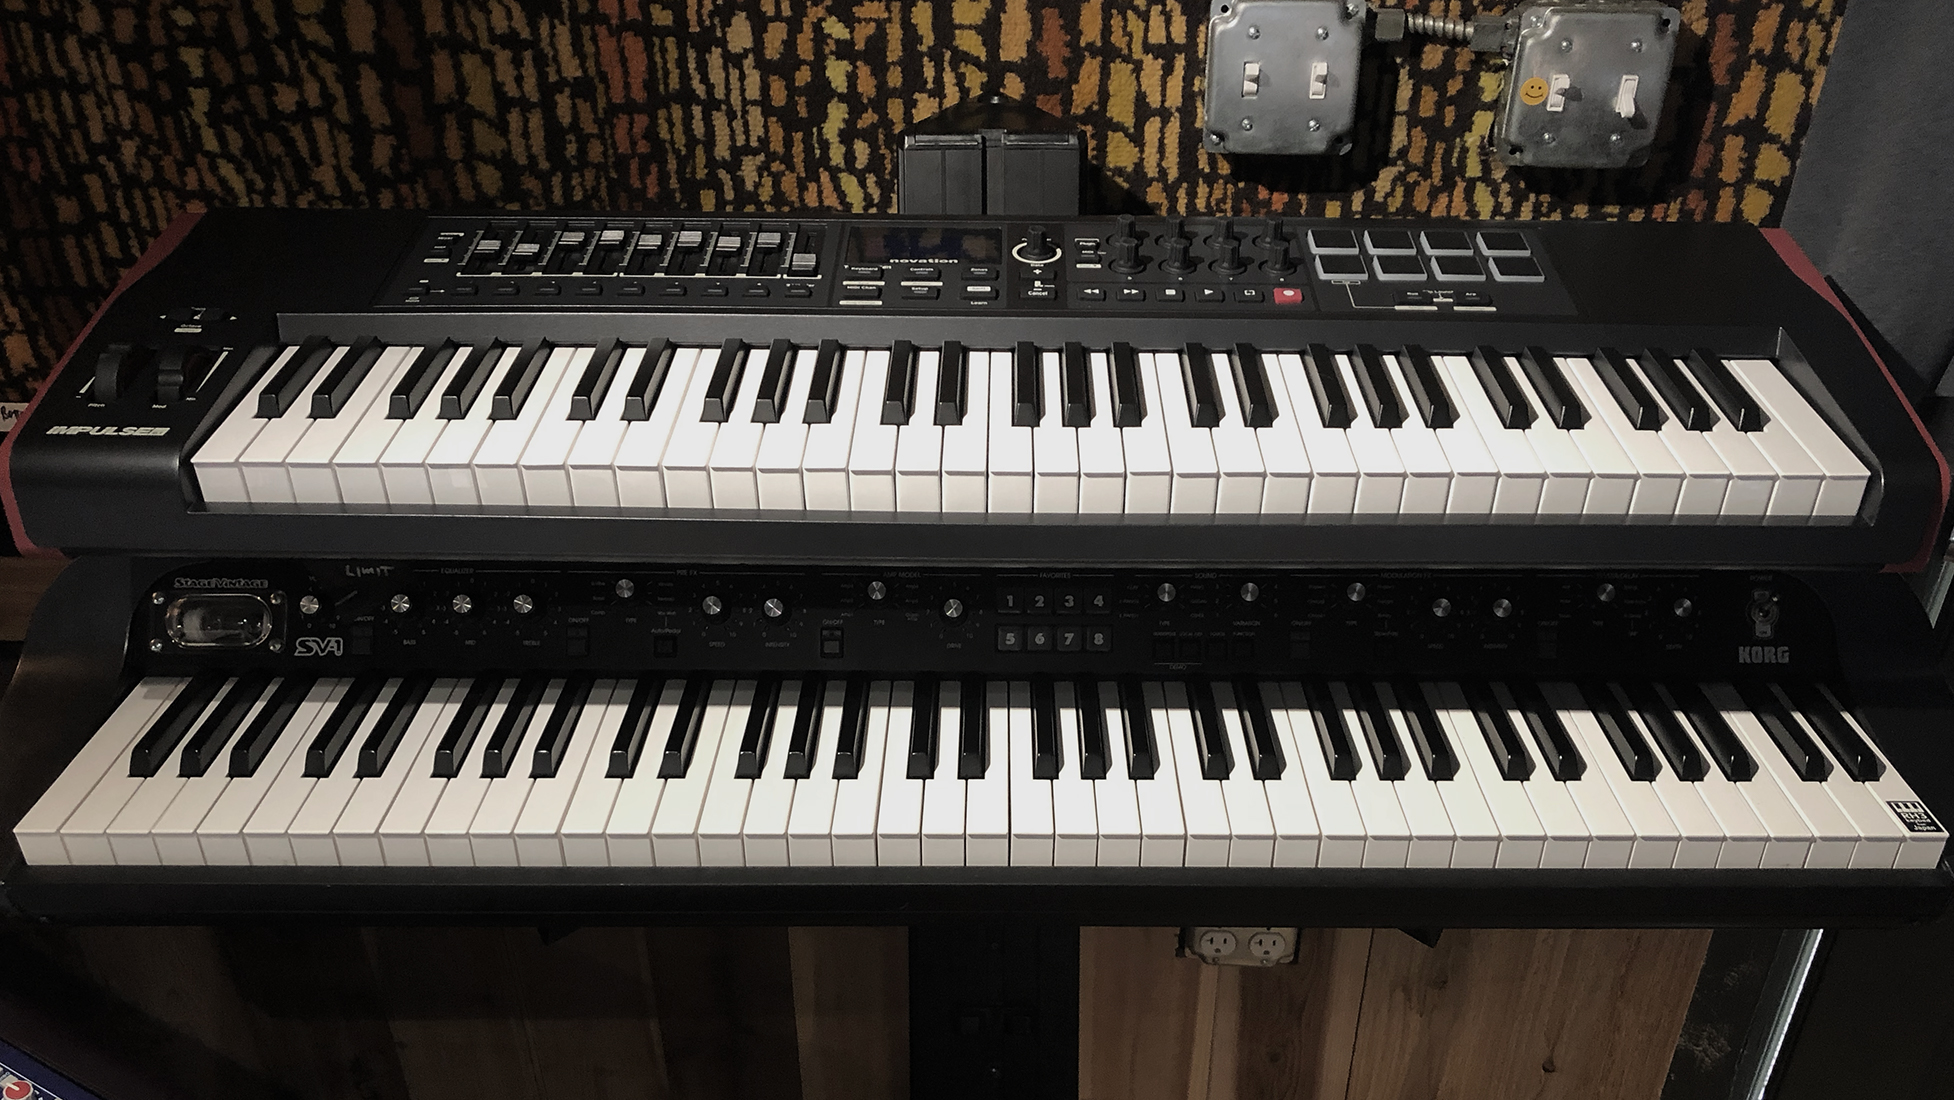 Novation Impulse 61 Controller above the Korg SV1 73 weighted key keyboard